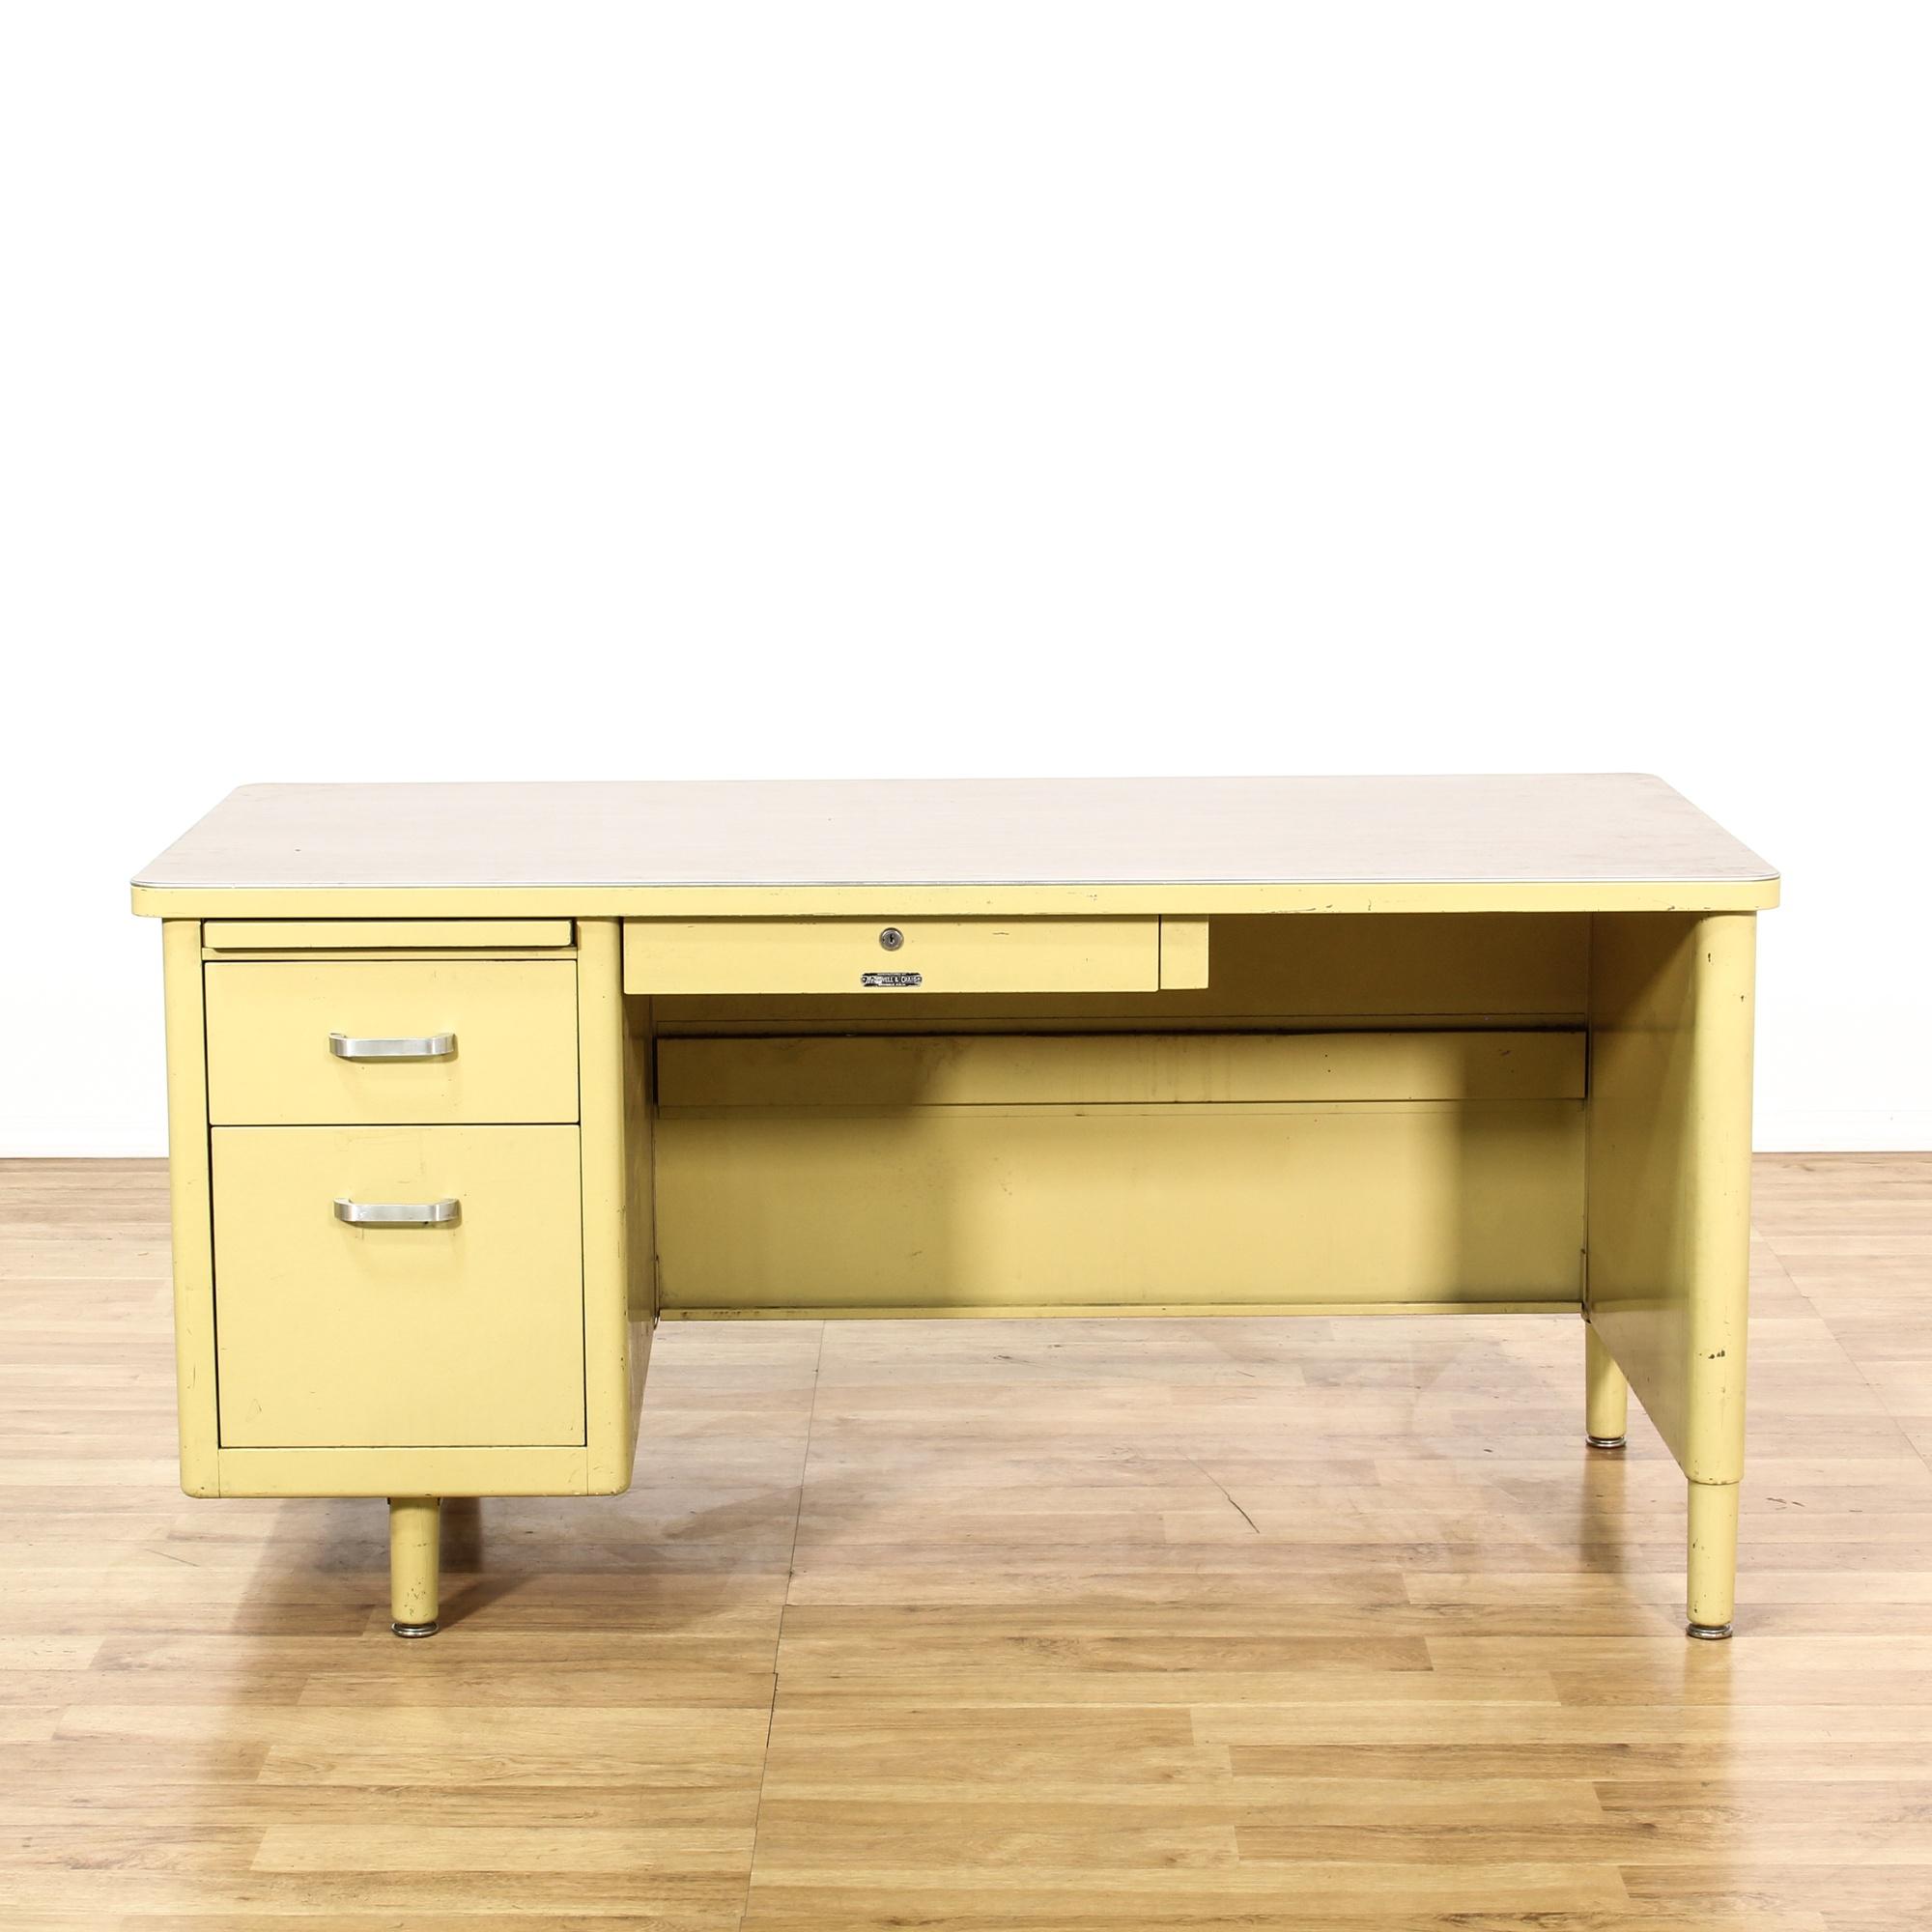 Retro Industrial Yellow Metal Tanker Desk Loveseat